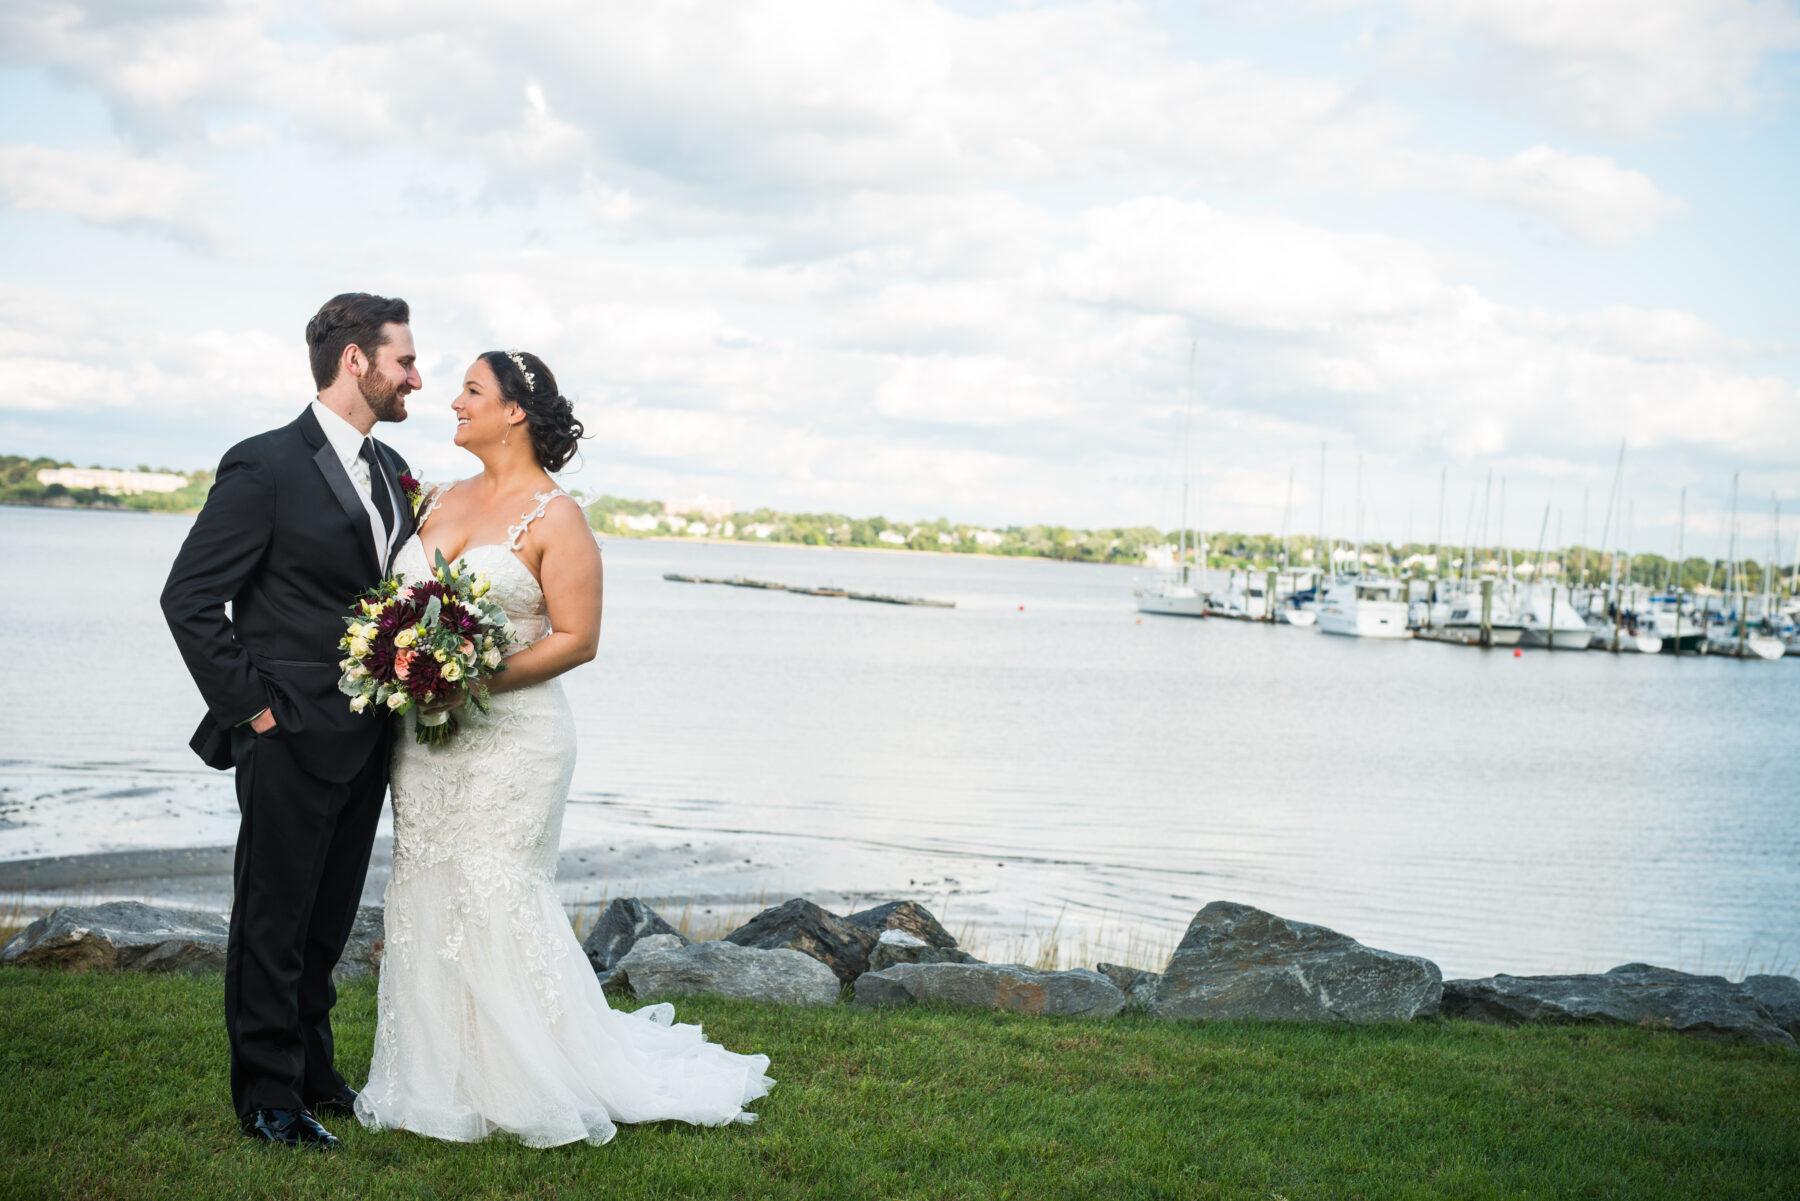 Rhodes on the Pawtuxet Cranston Wedding Carolyn and Tony Blueflash Photography 11